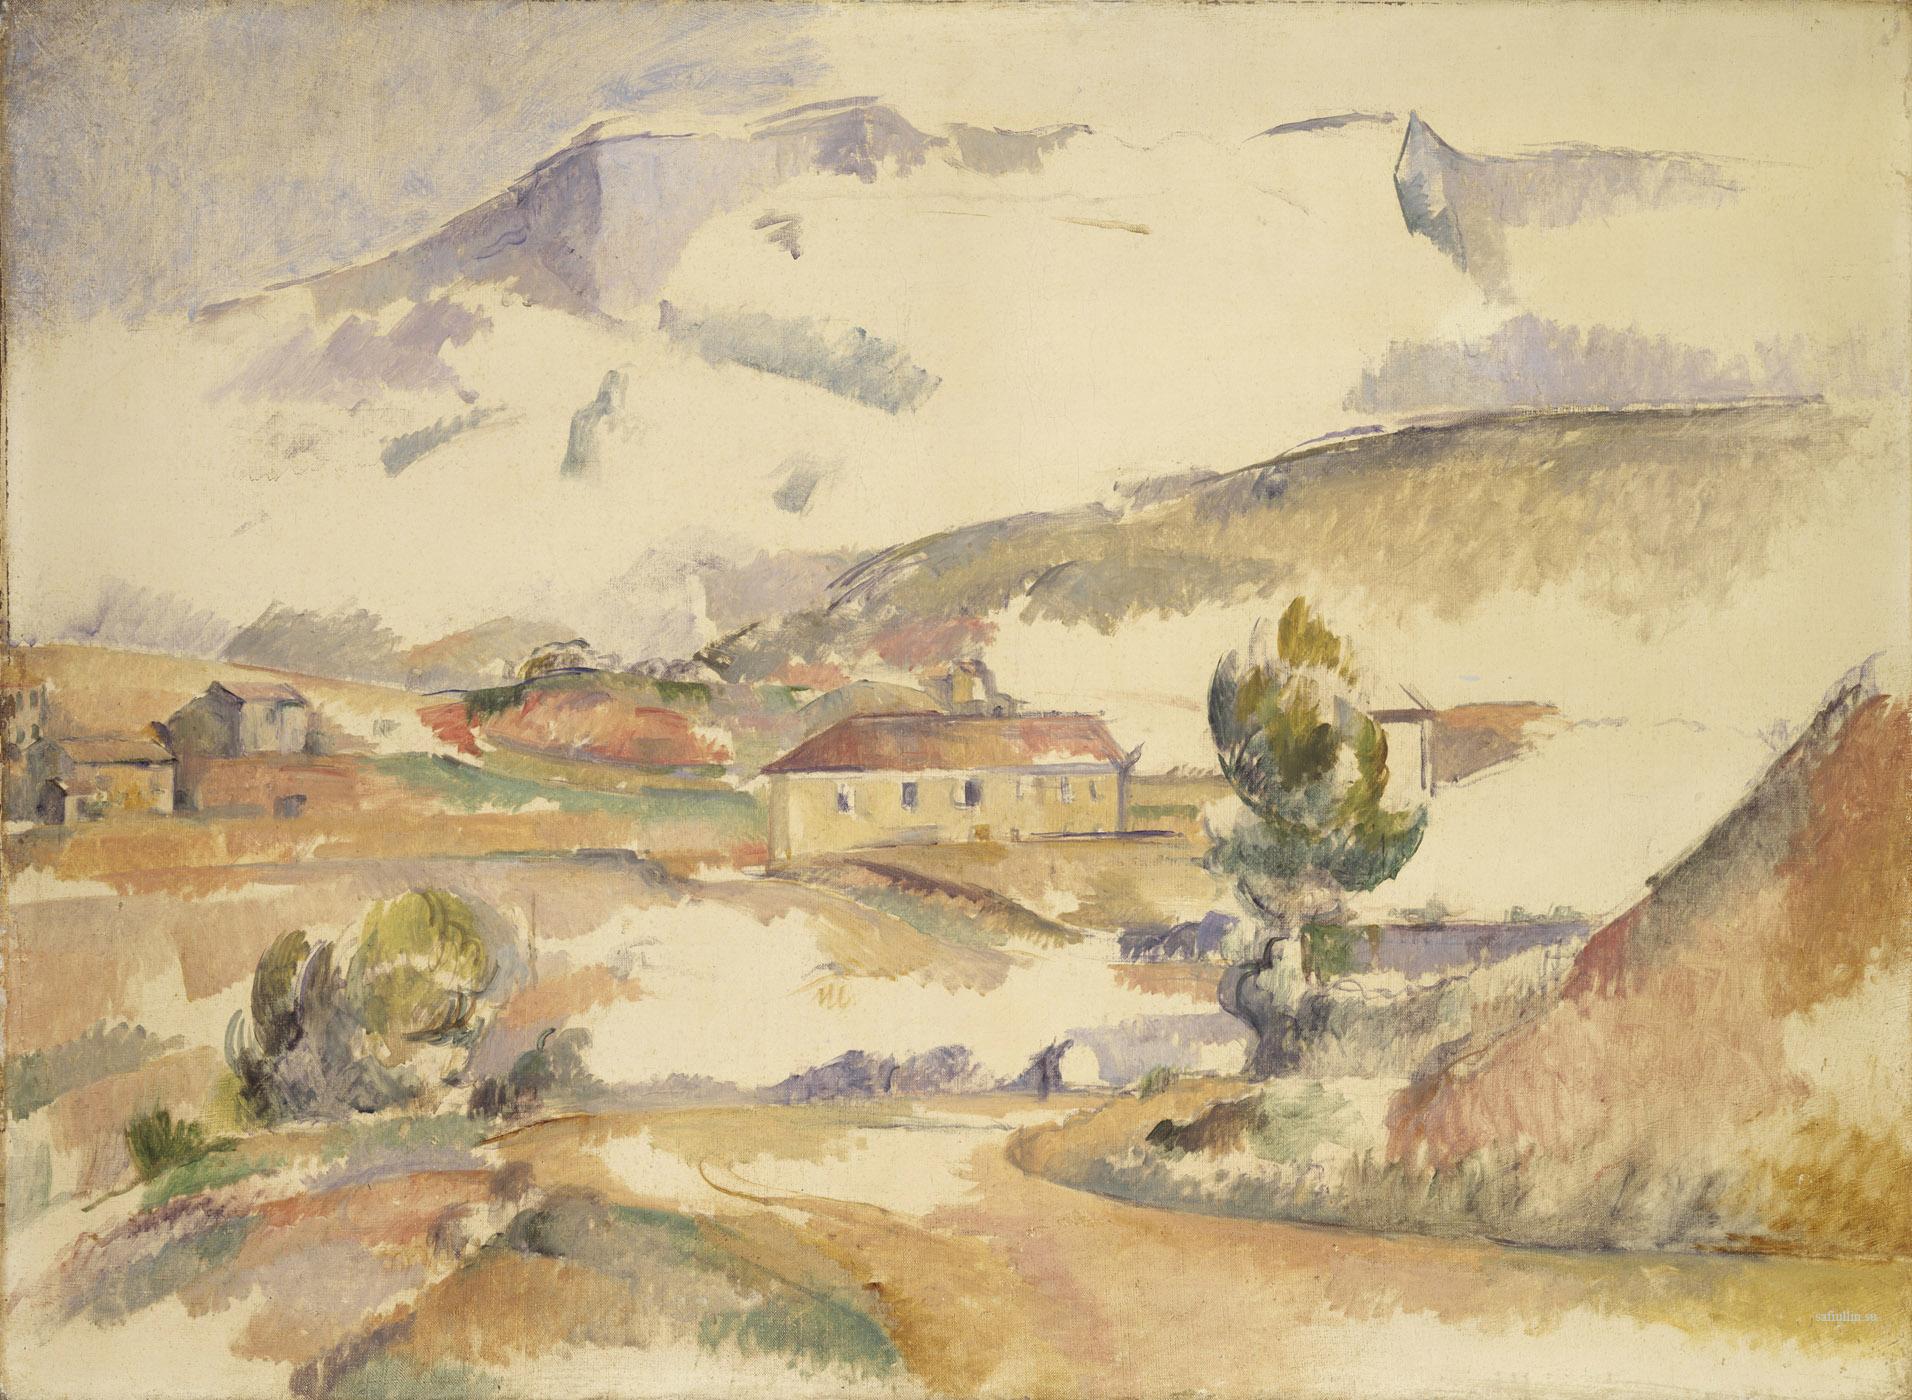 Сезанн картина Sainte-Victoire1886 пейзажи природы Сафиуллин